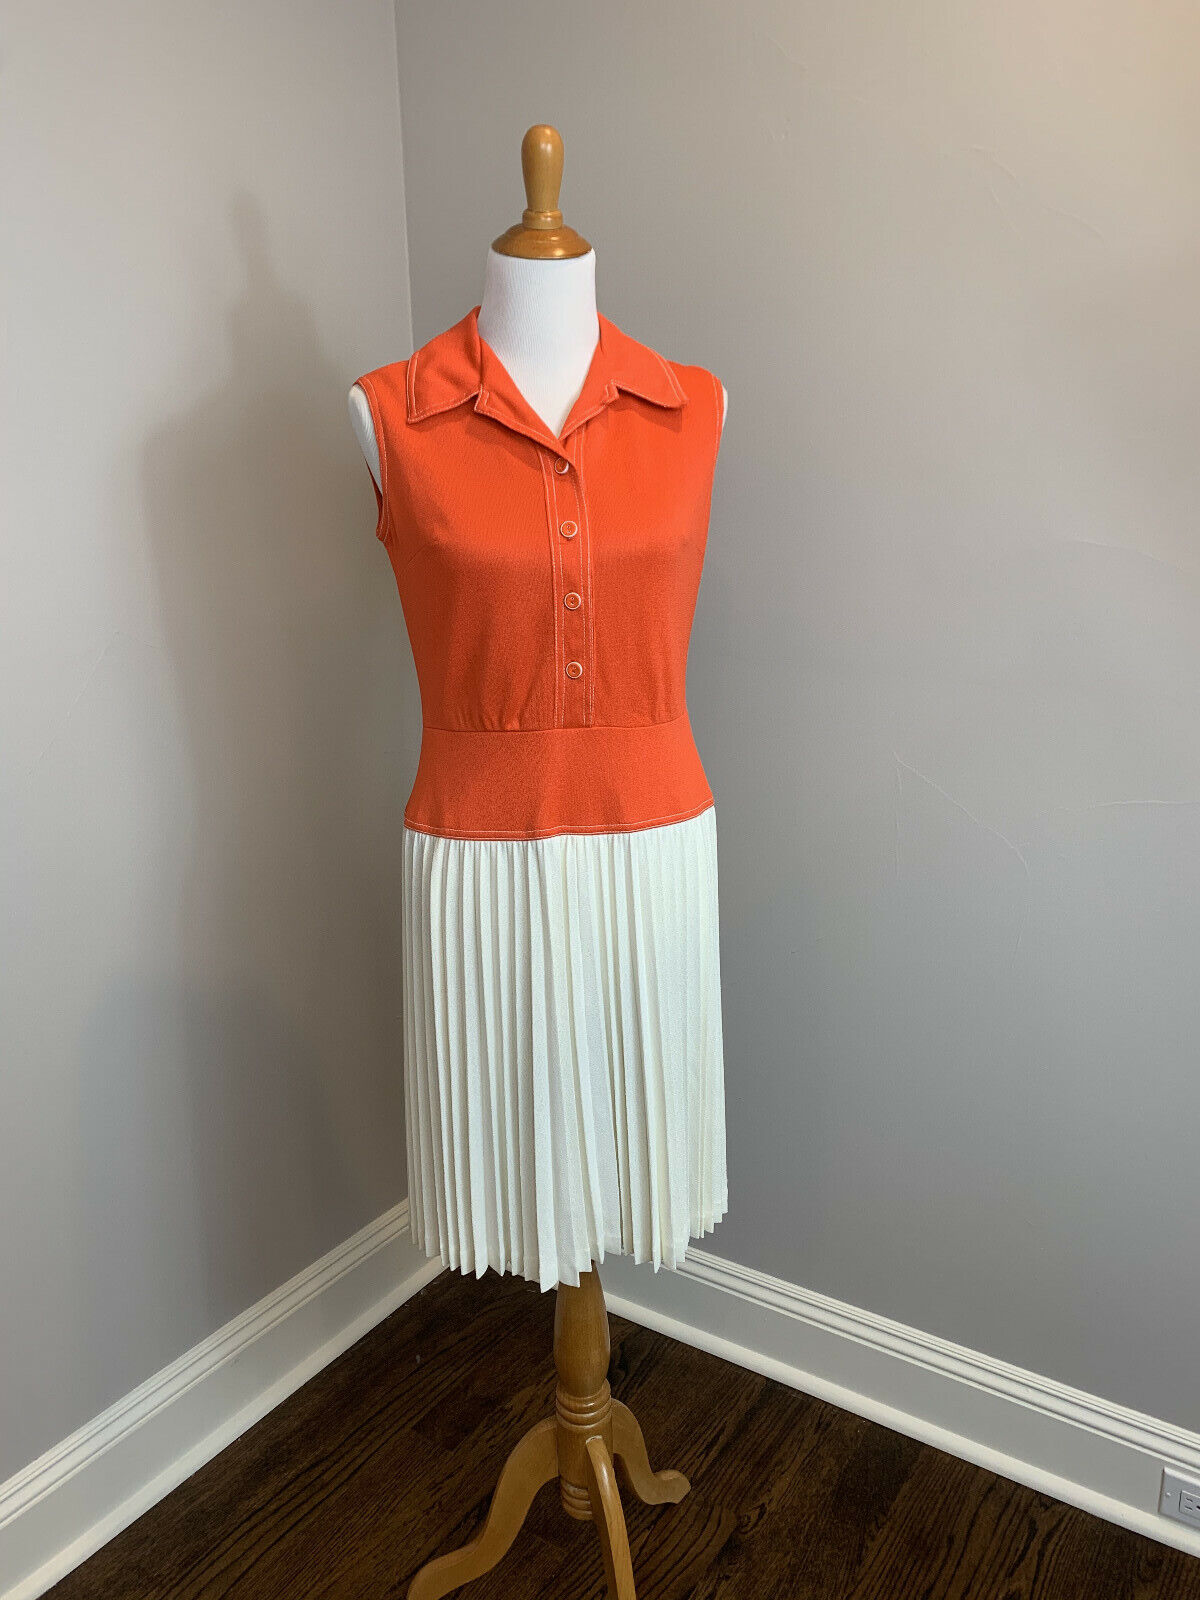 Sacony Ciella Vintage 60s Dress with 20s-30's Sty… - image 1